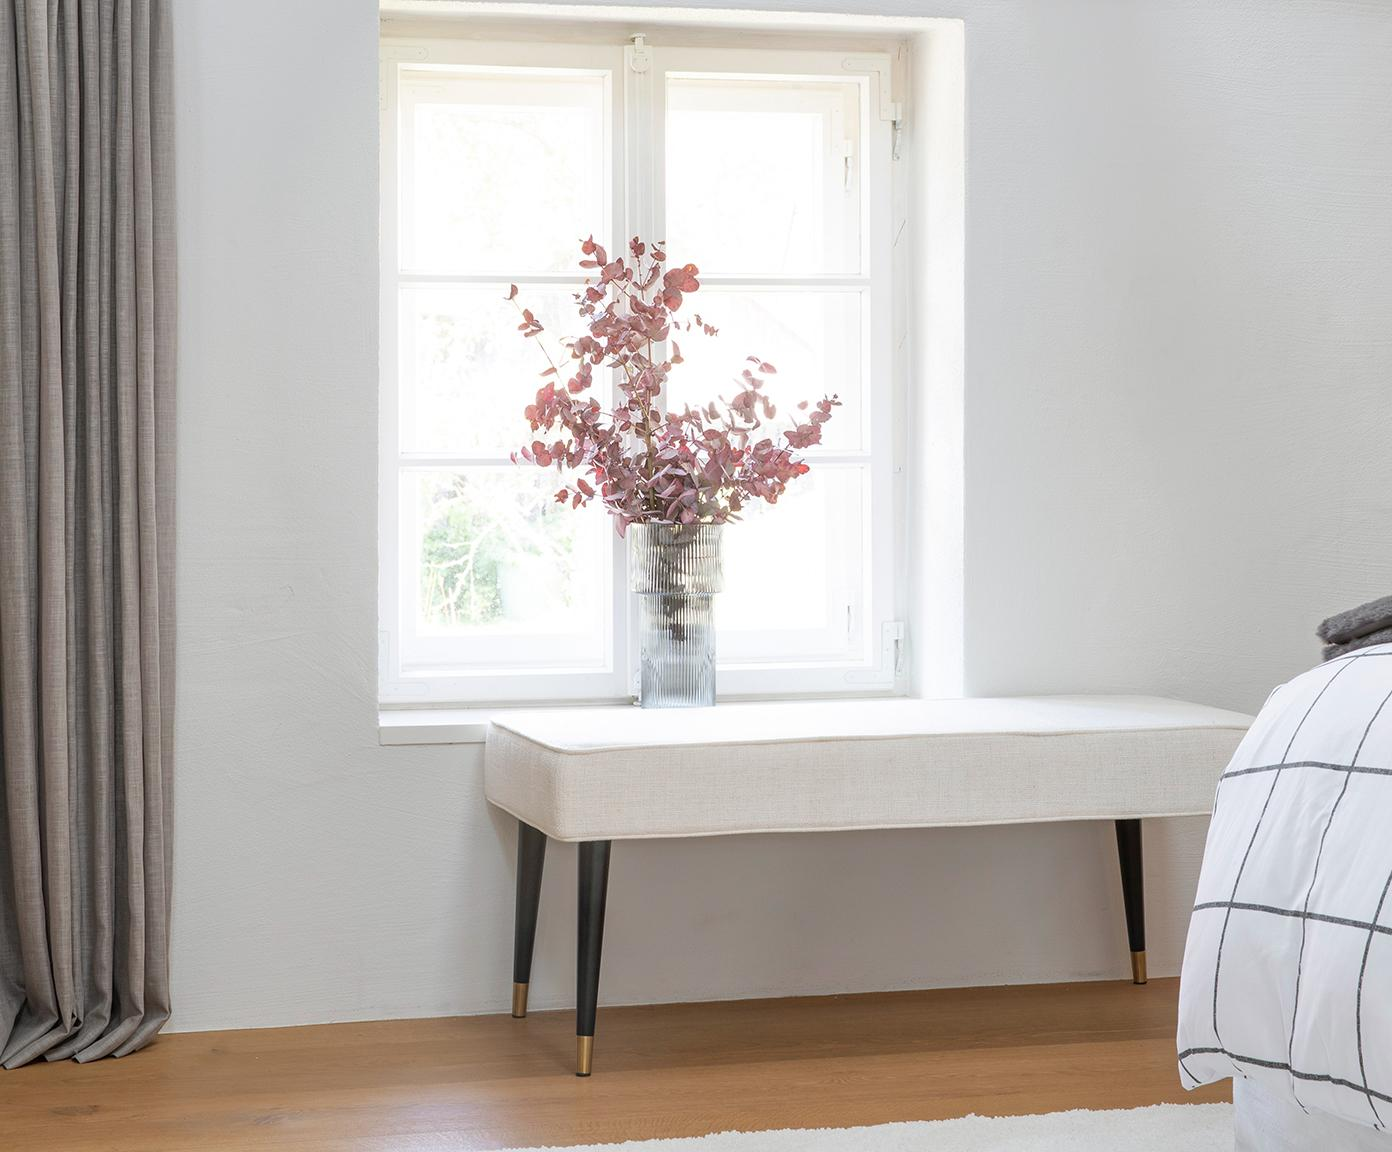 Bank Beverly, Bekleding: polyester, Frame: eucalyptushout, Poten: gepoedercoat metaal, Crèmekleurig, 110 x 46 cm